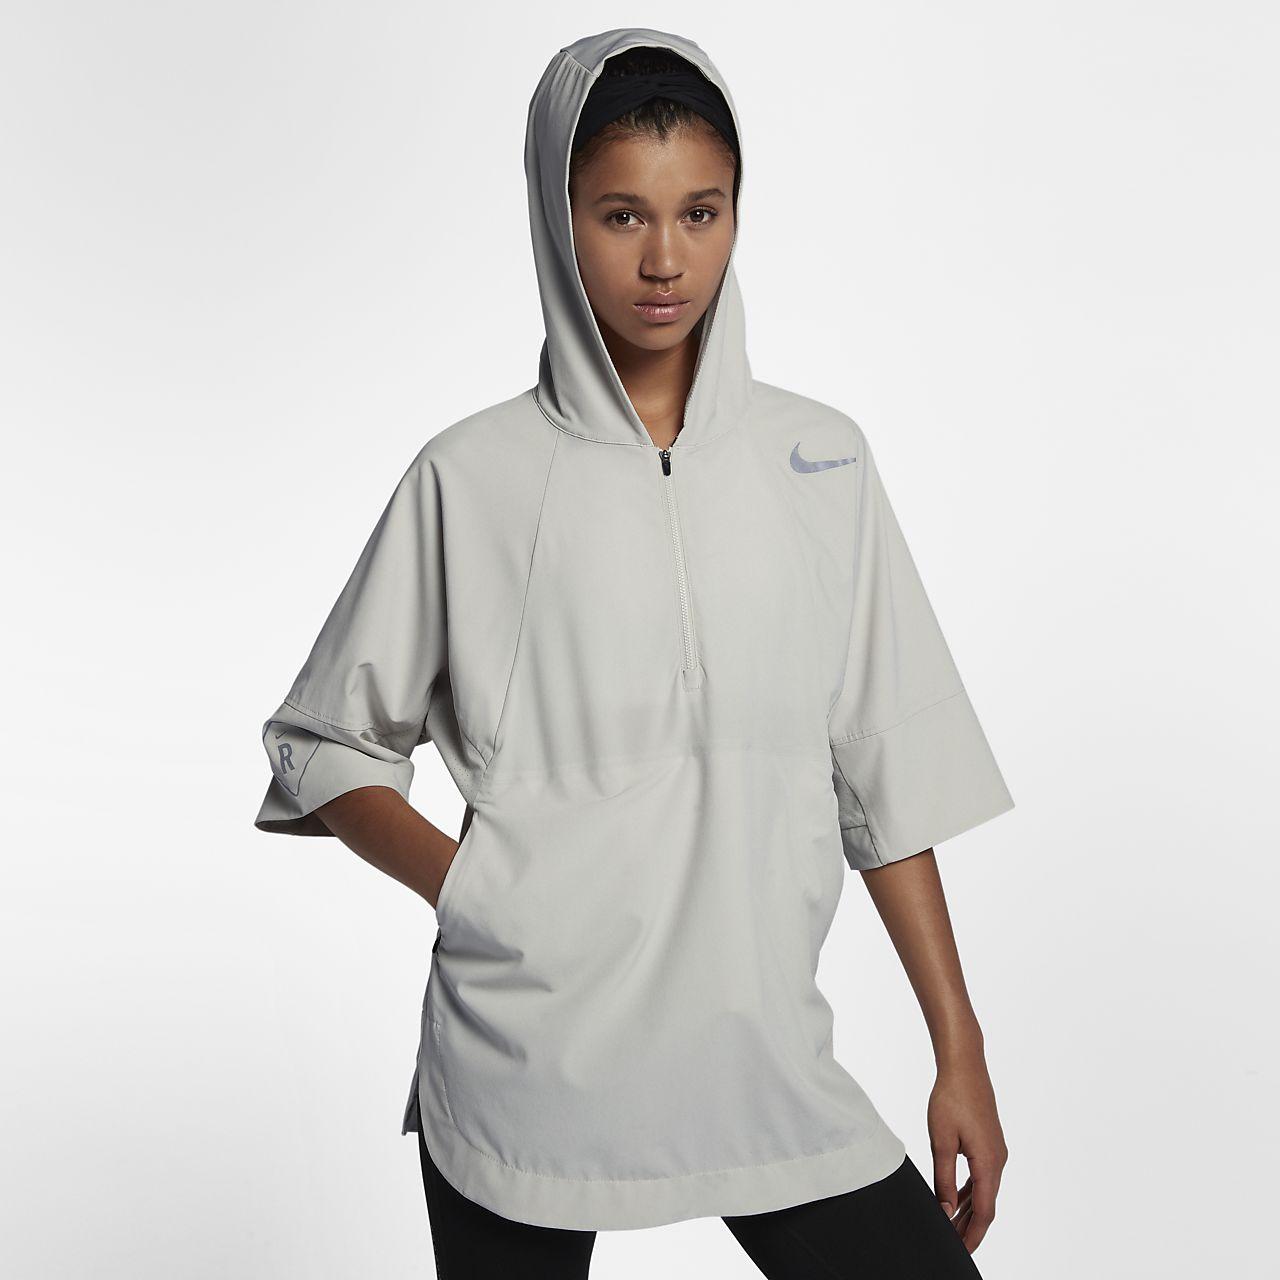 Nike Run Division Unisex Short-Sleeve Running Jacket